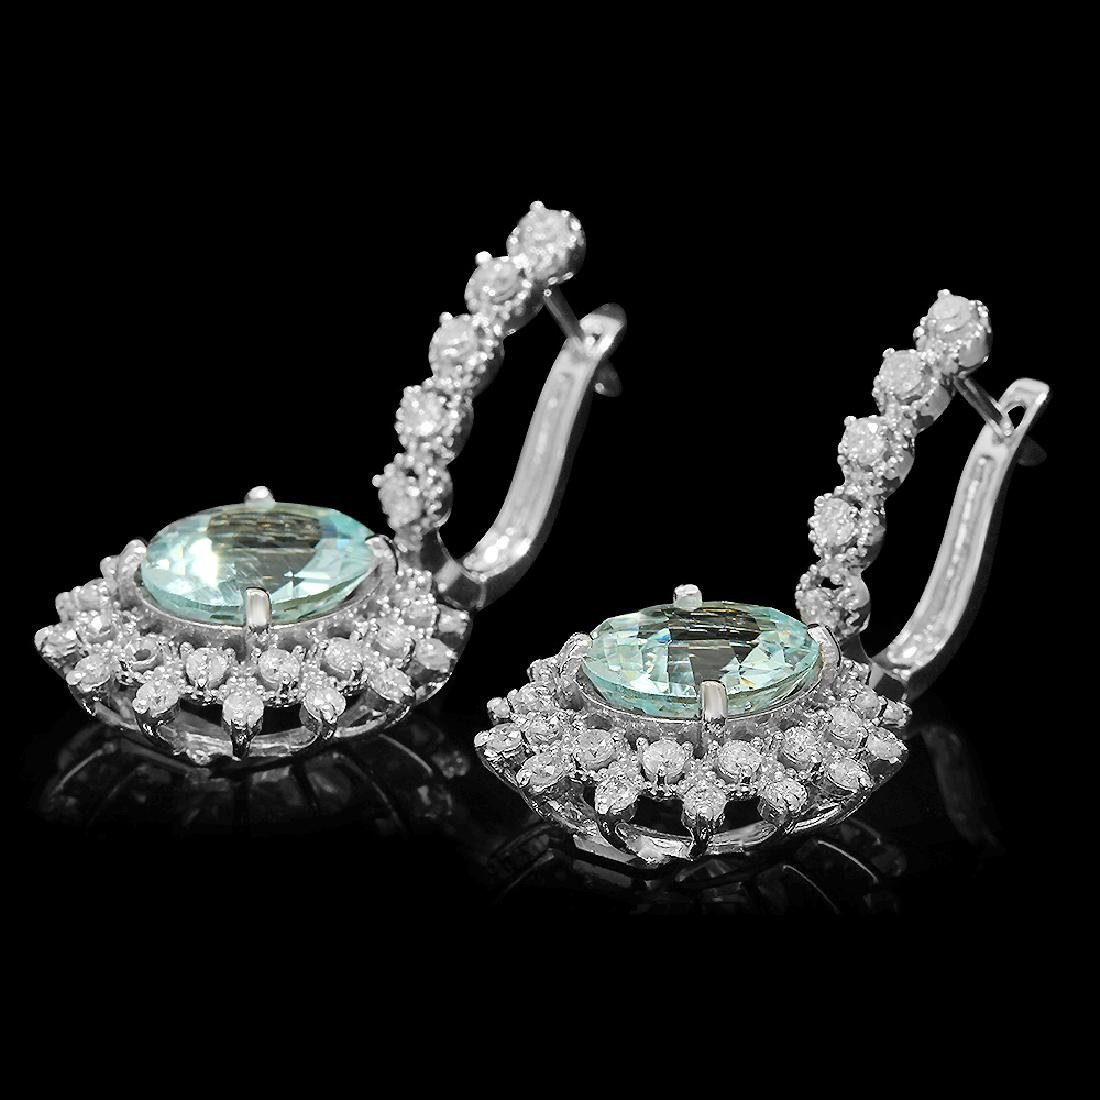 14K Gold 6.28ct Aquamarine 1.60ct Diamond Earrings - 2